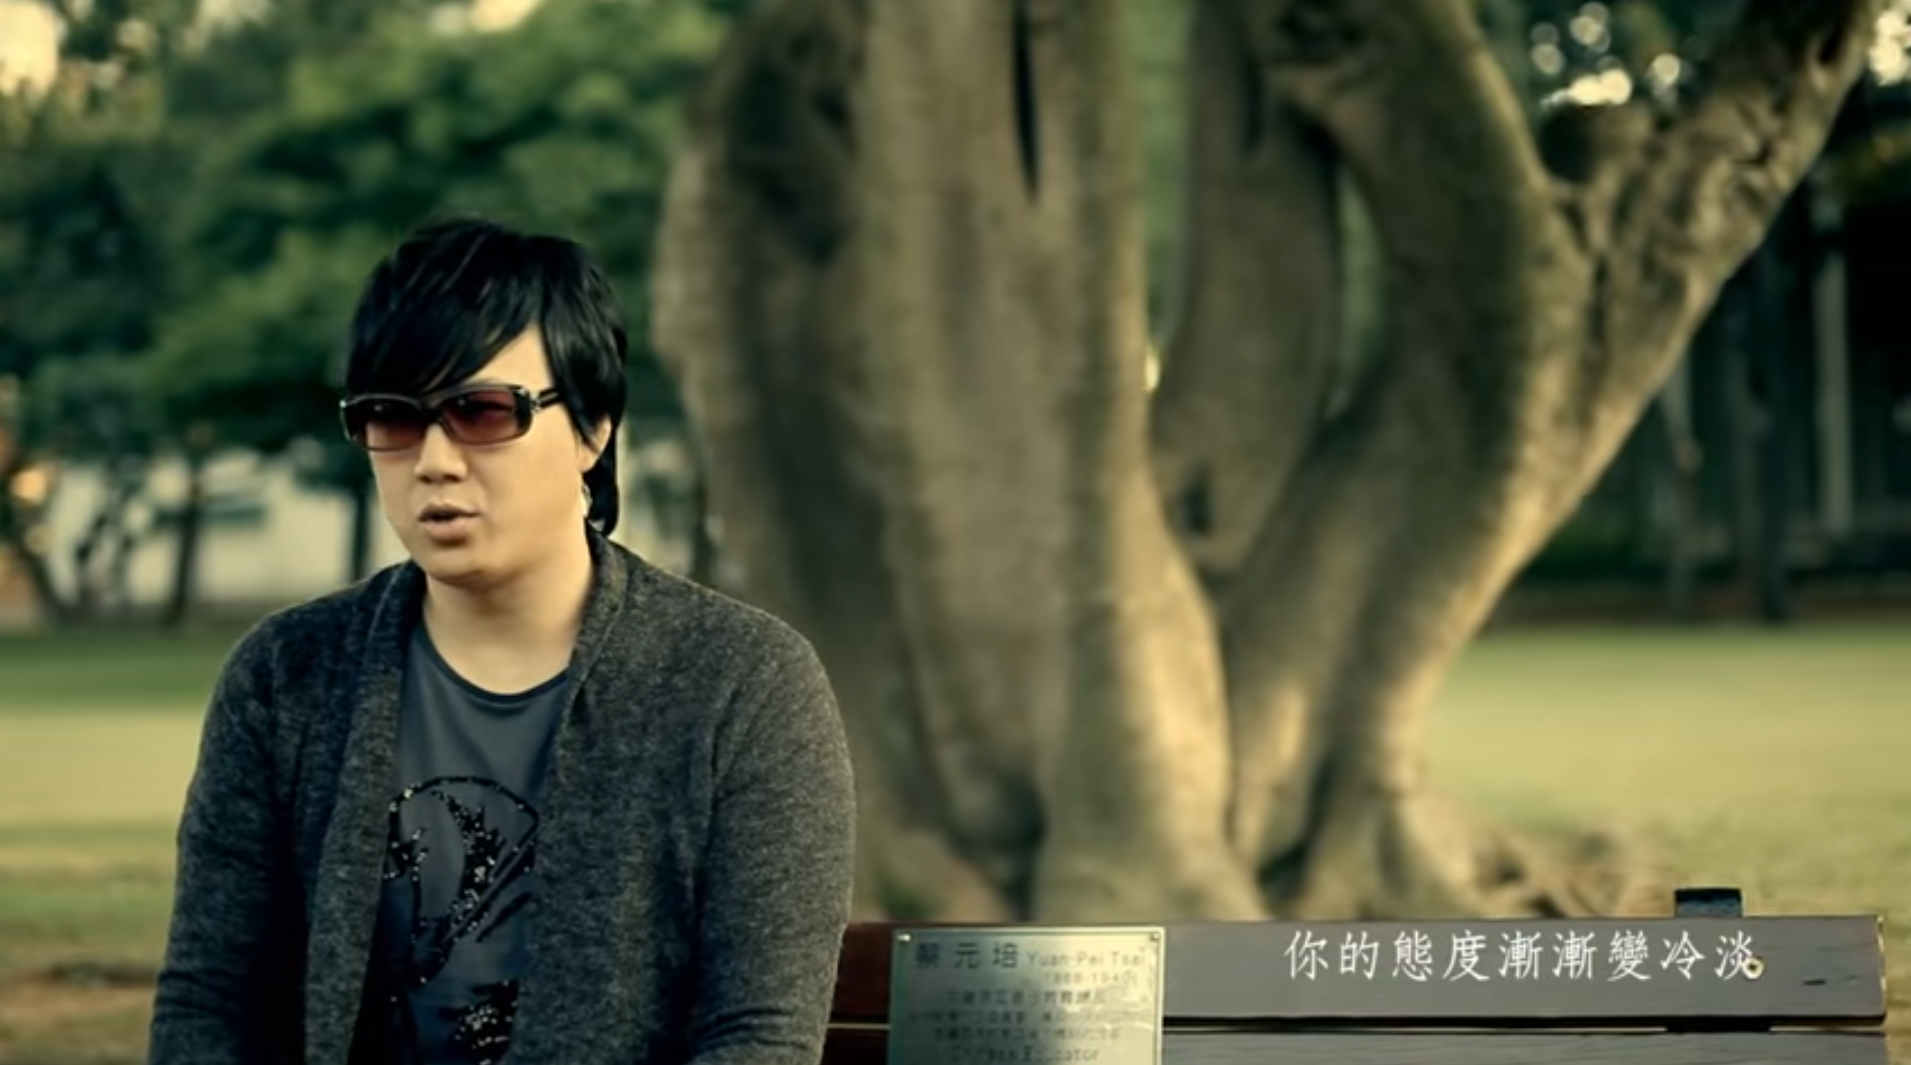 MV 蕭煌奇+李嘉- 愛情的負擔 Music Video